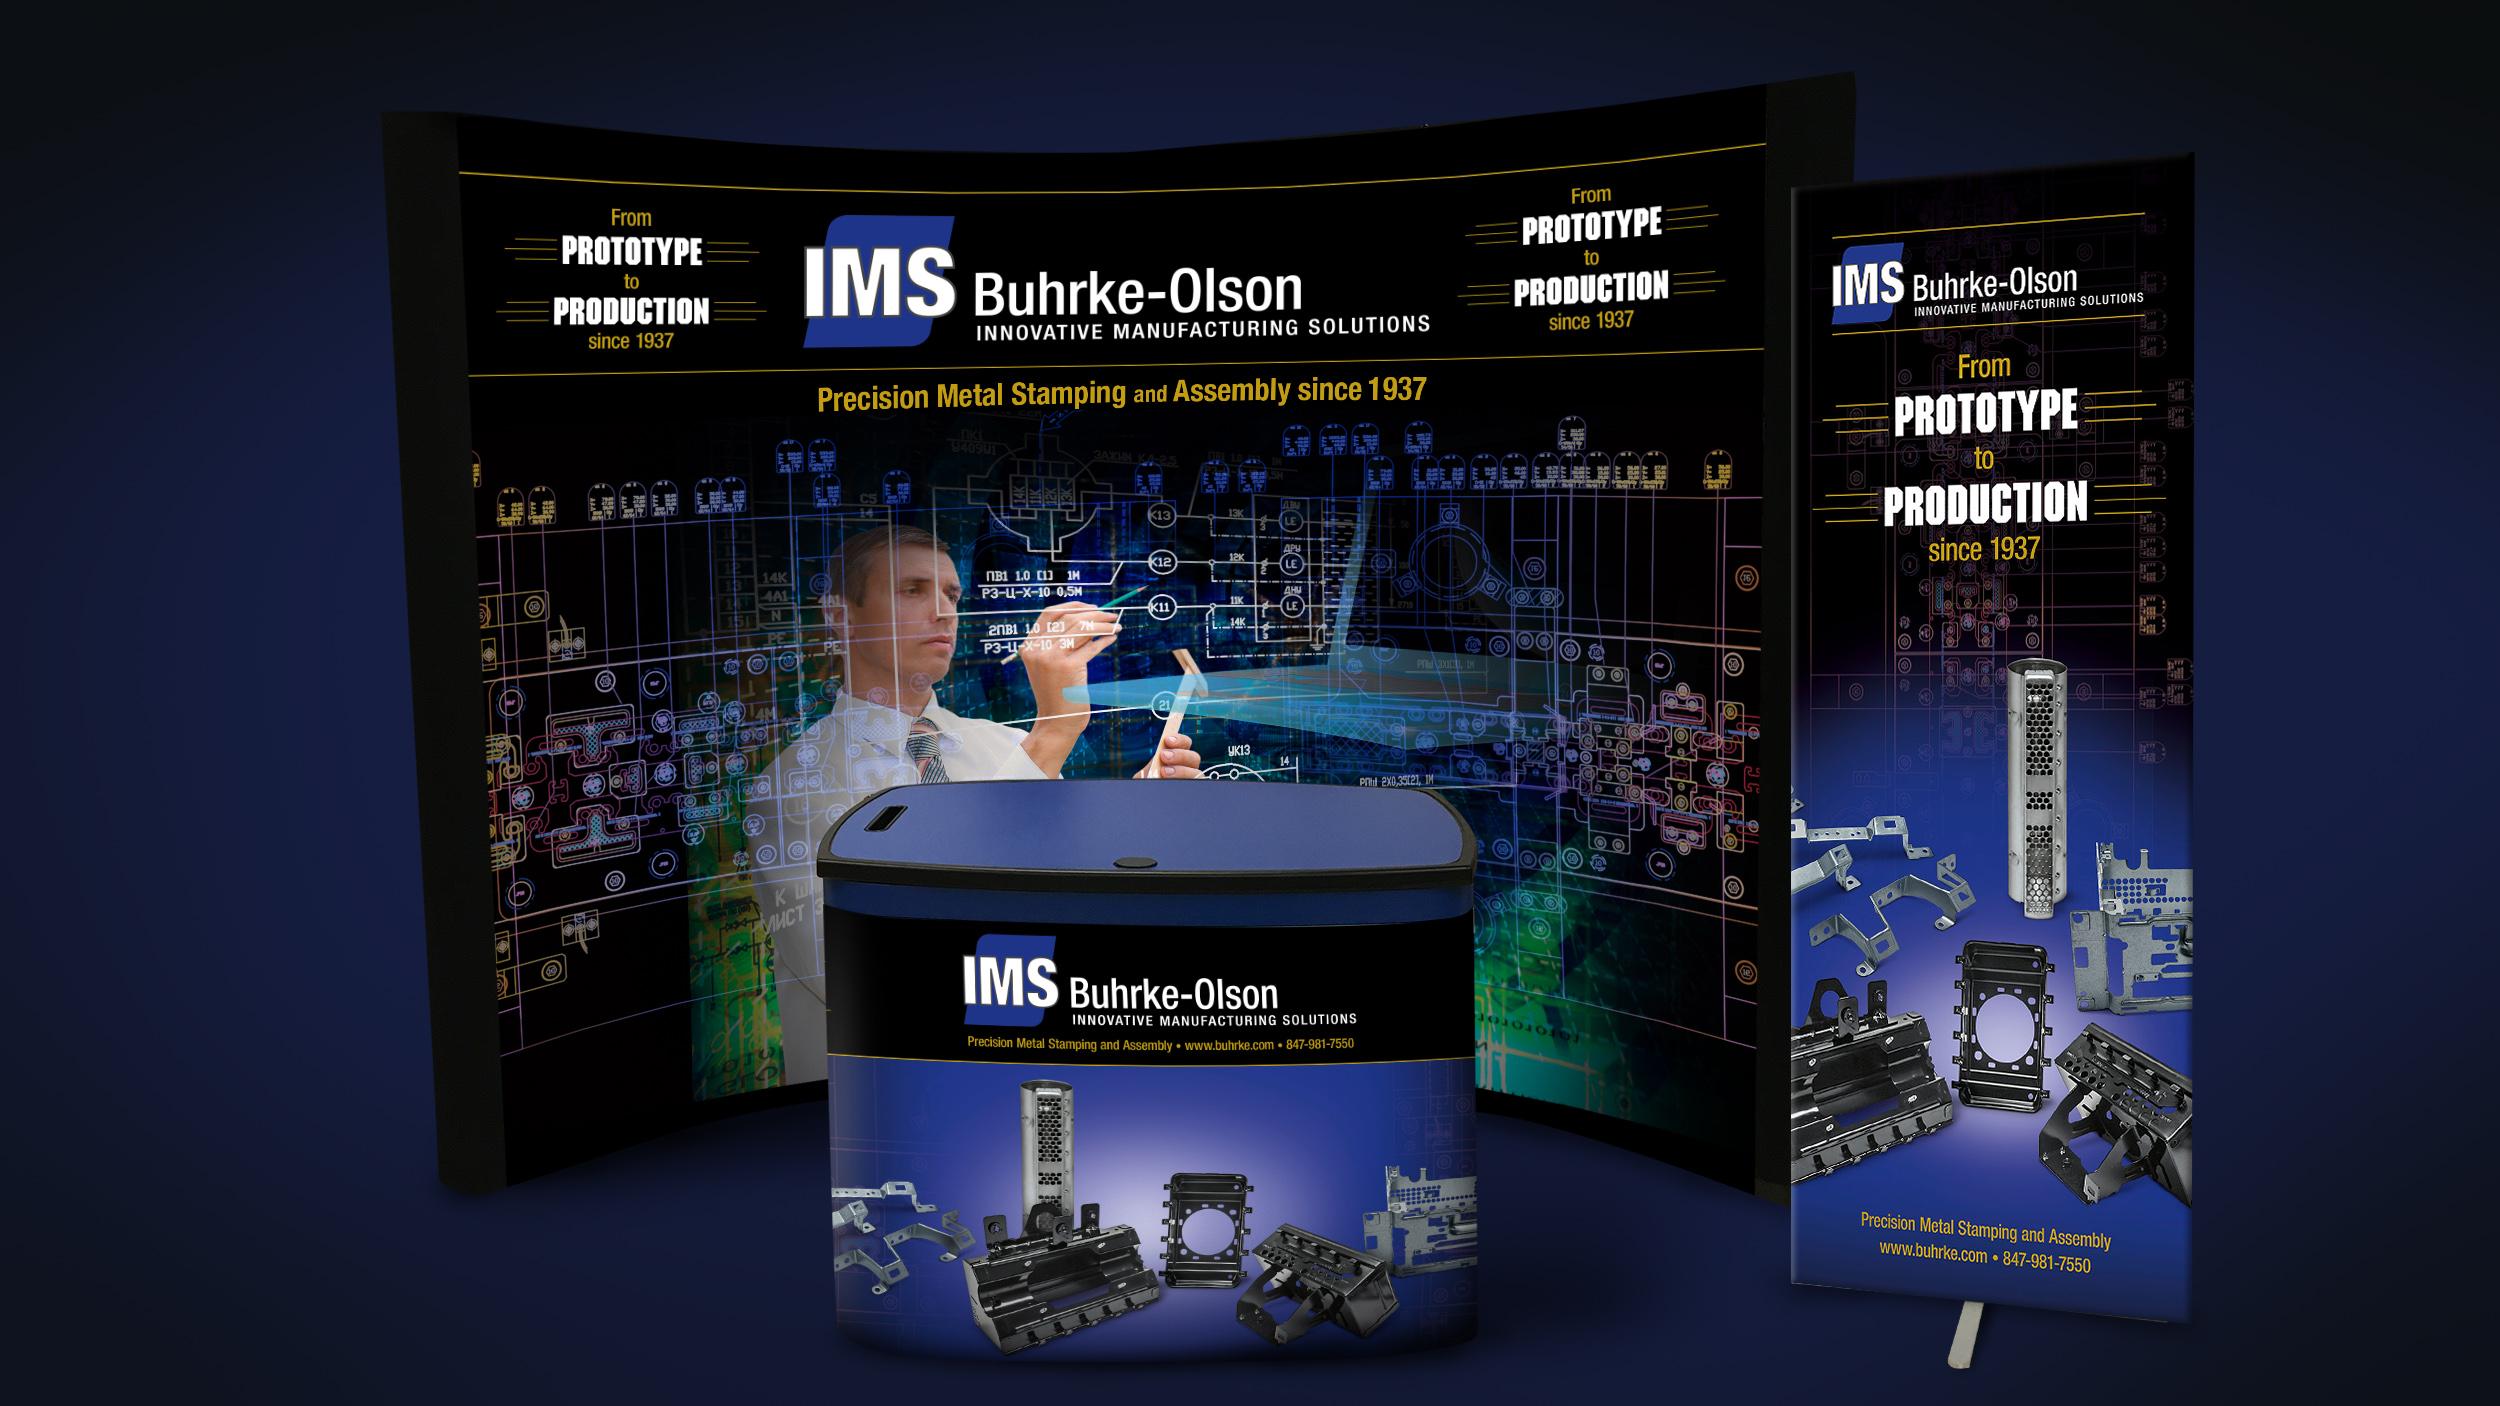 Tradeshow-booth-IMS-Buhrke-olsonEnvironmental-Large-Format-design.jpg